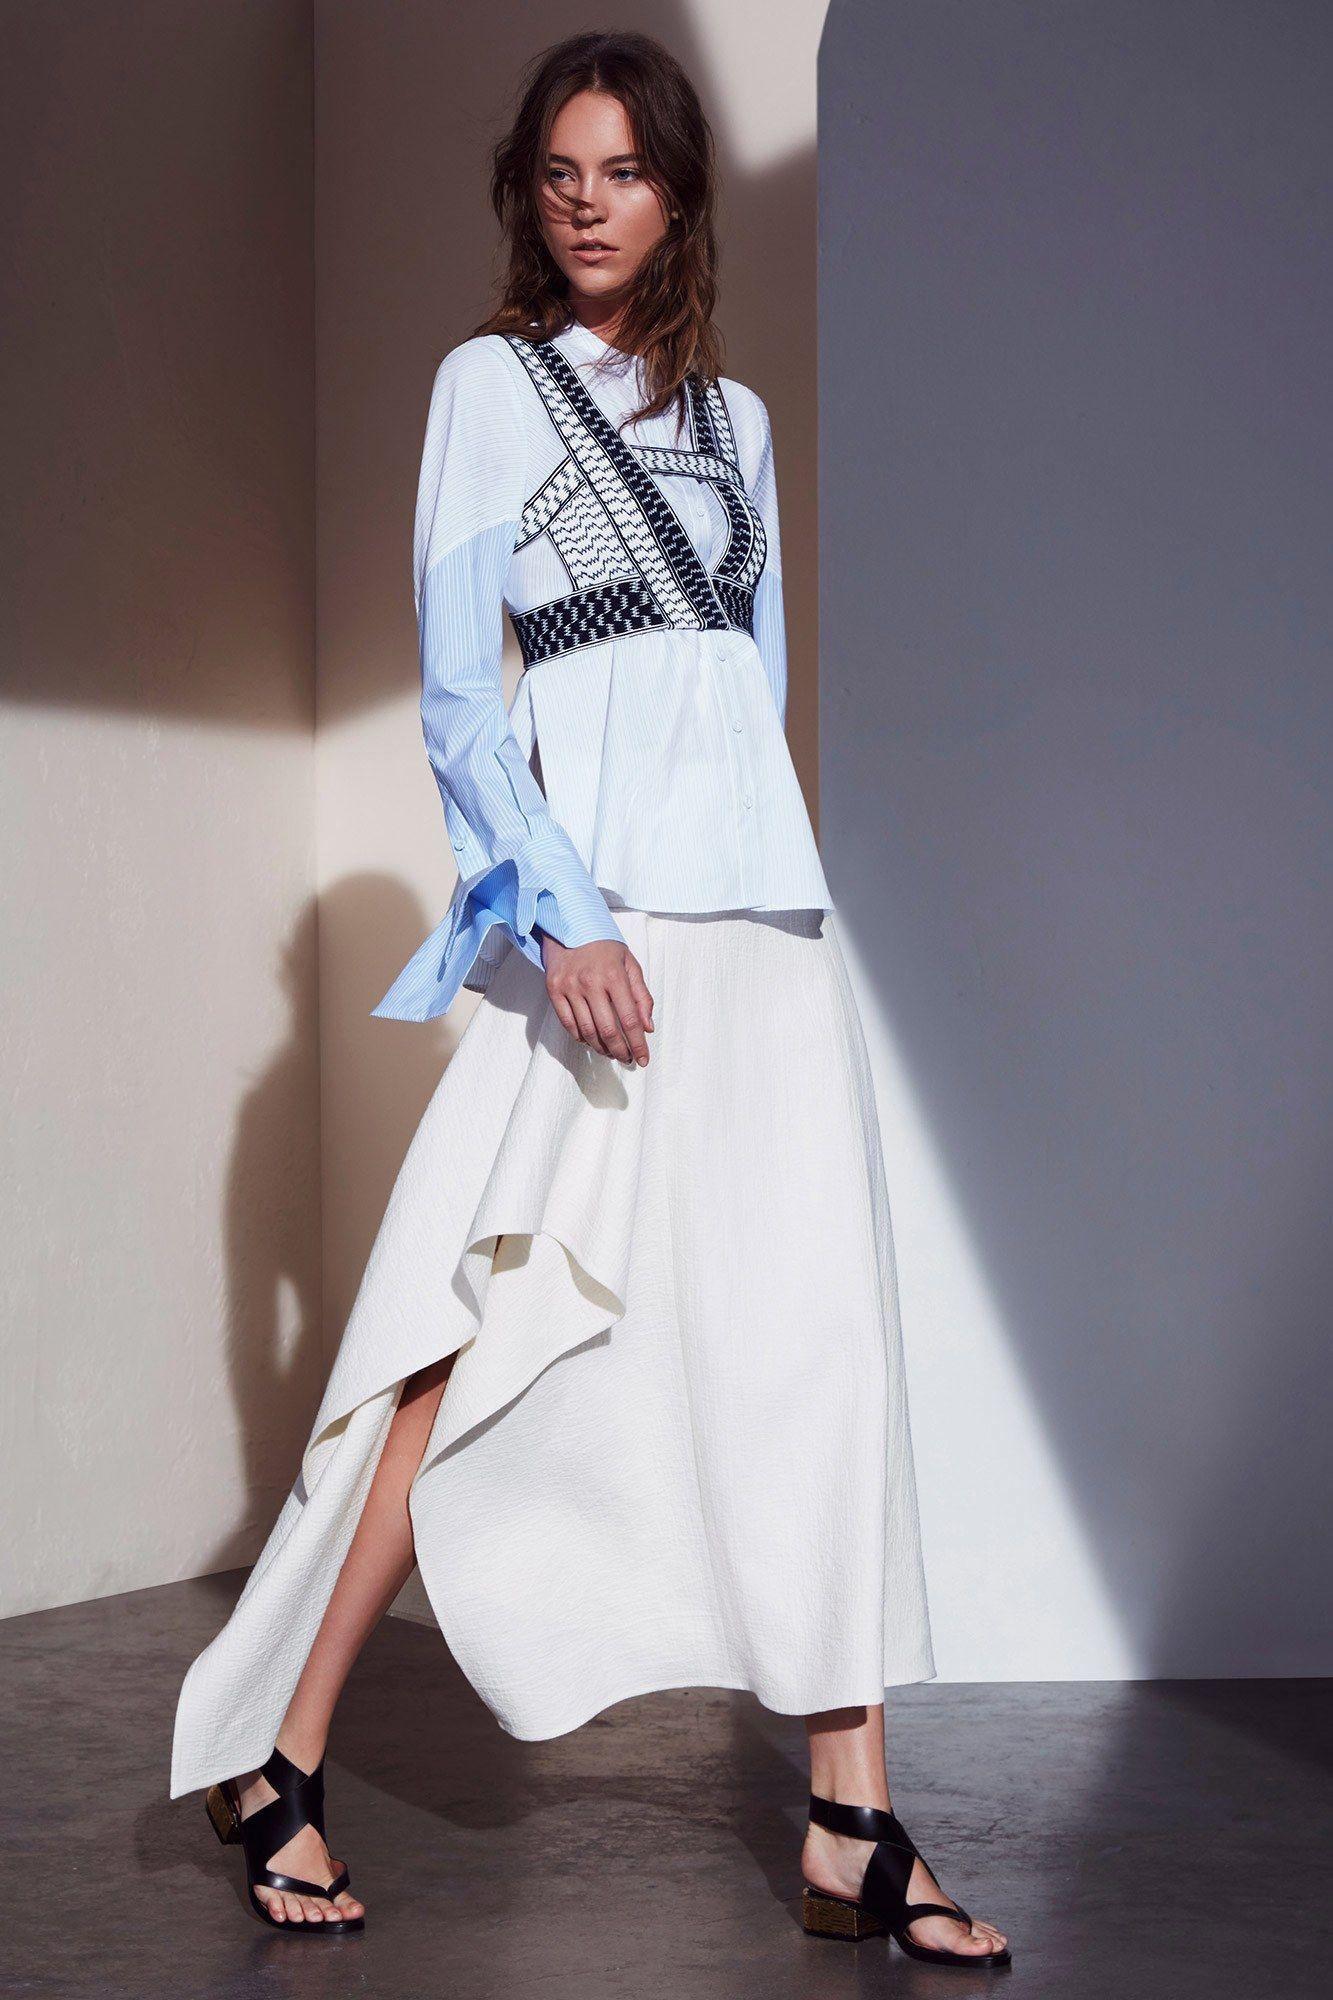 Bcbg max azria fashion show 2018 61